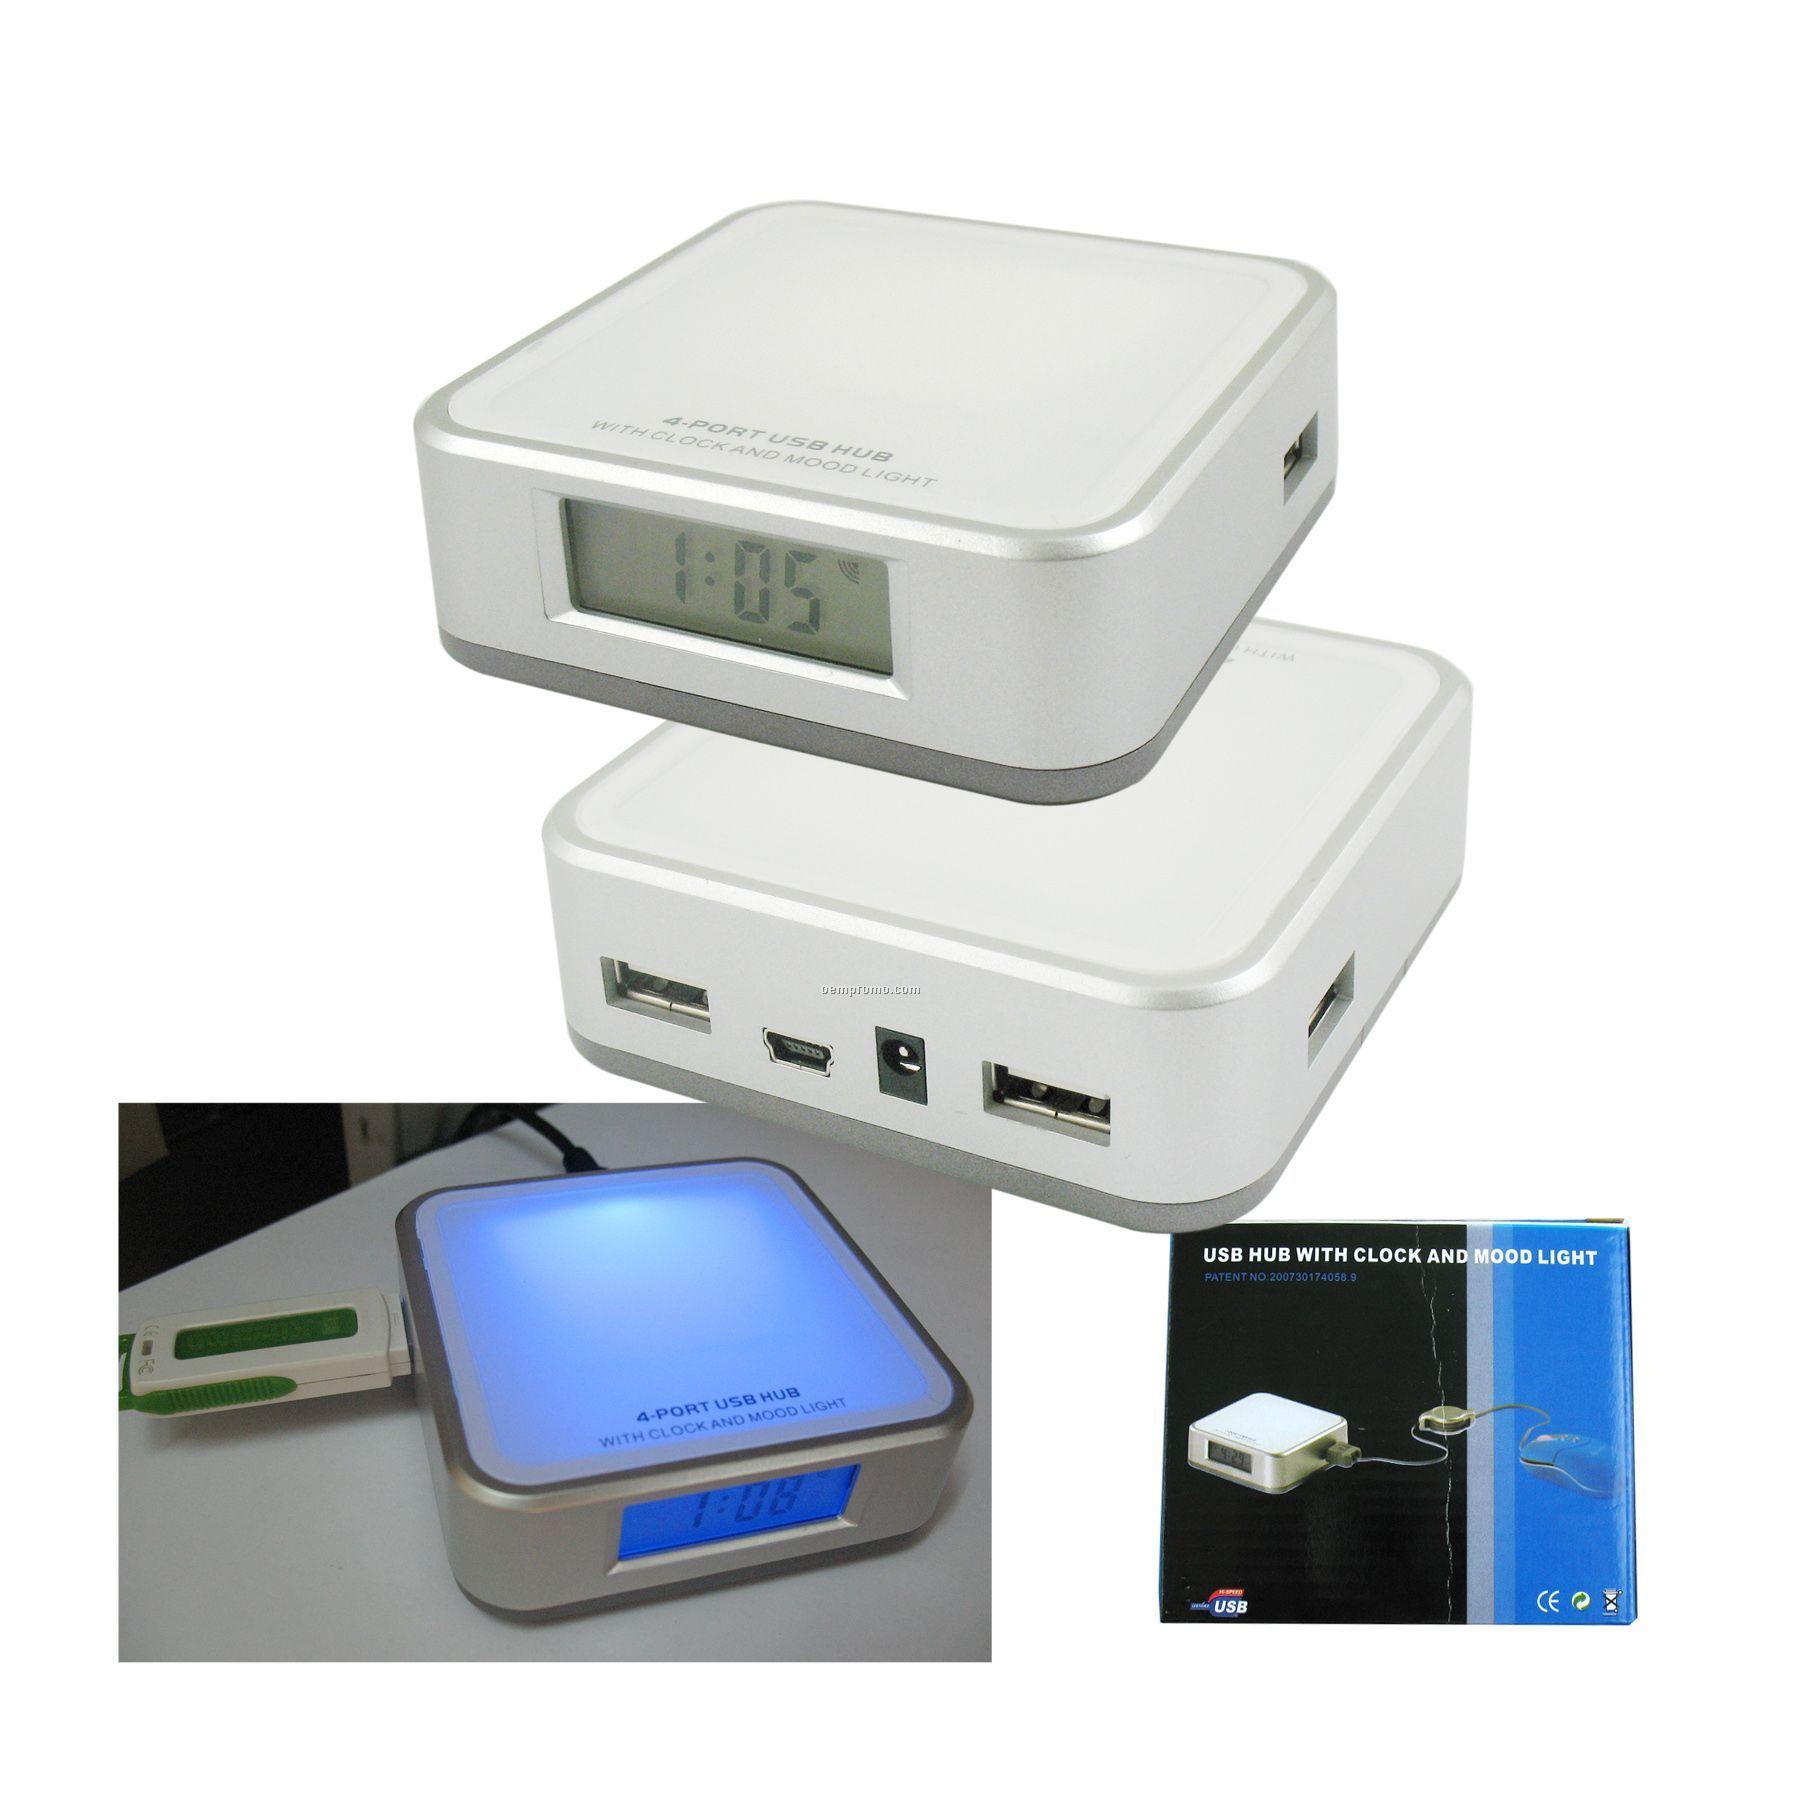 Clock 4 Port USB Hub